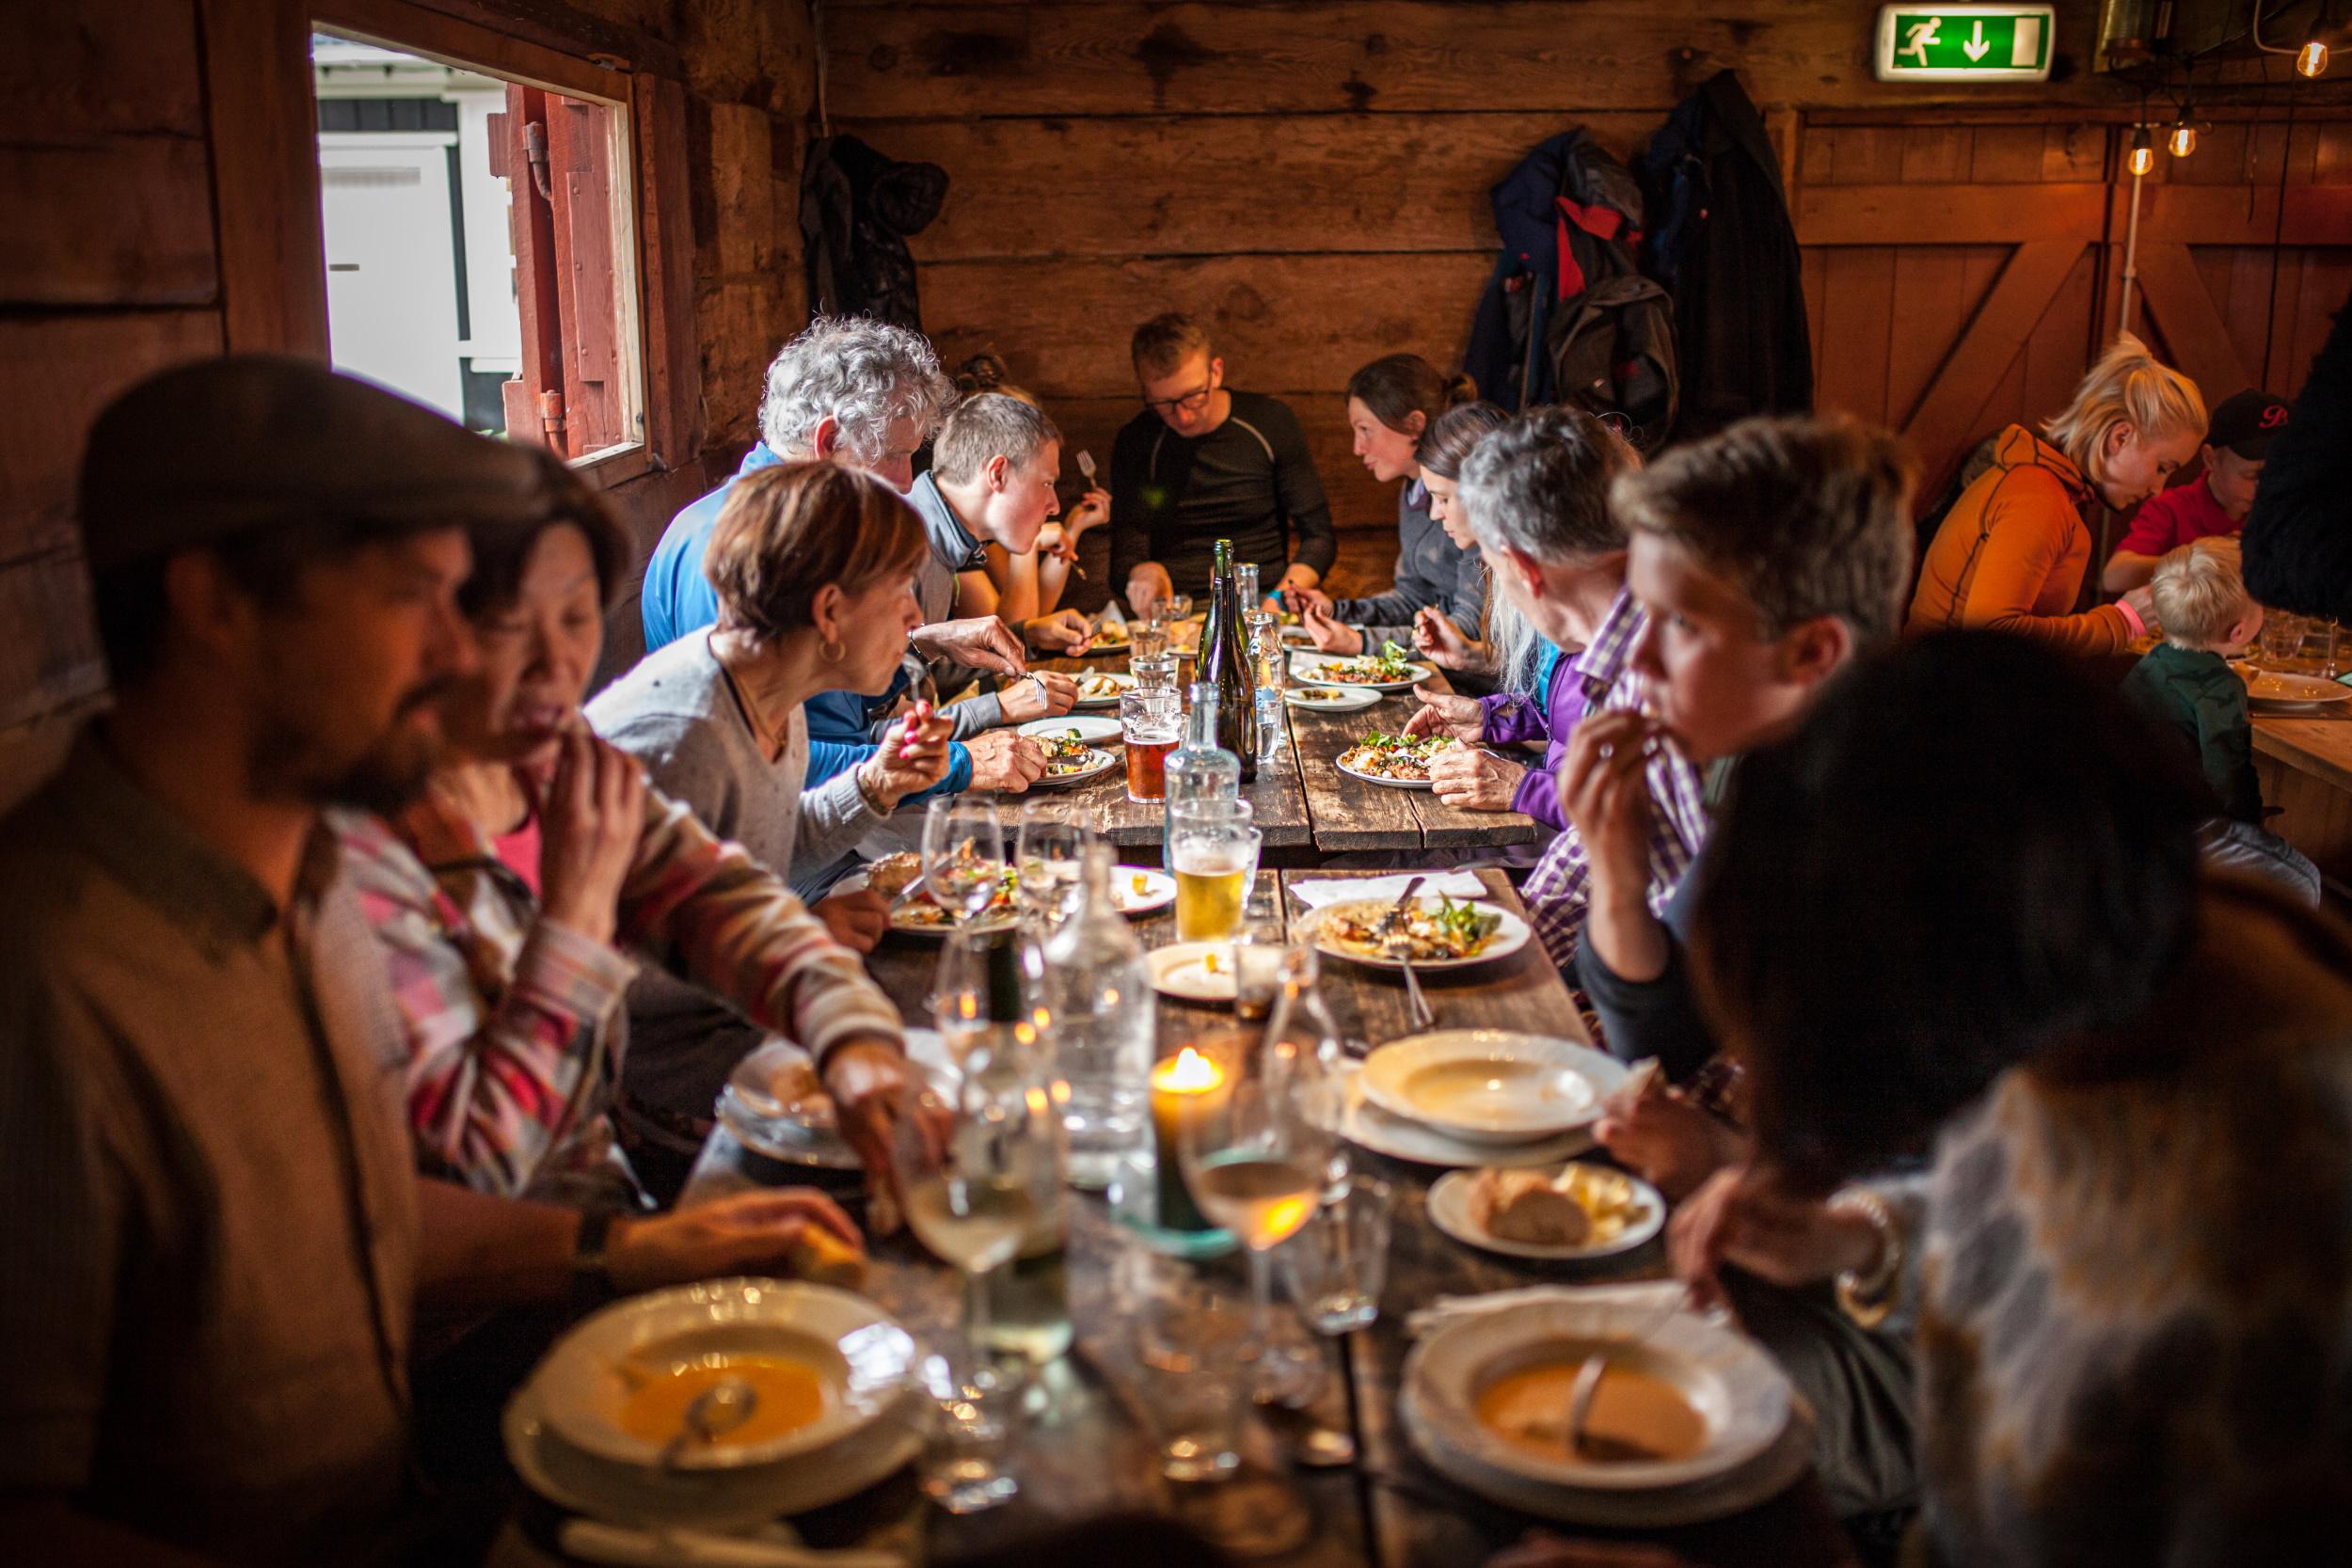 People dining at Tjöruhúsid restaurant in Ísafjördur